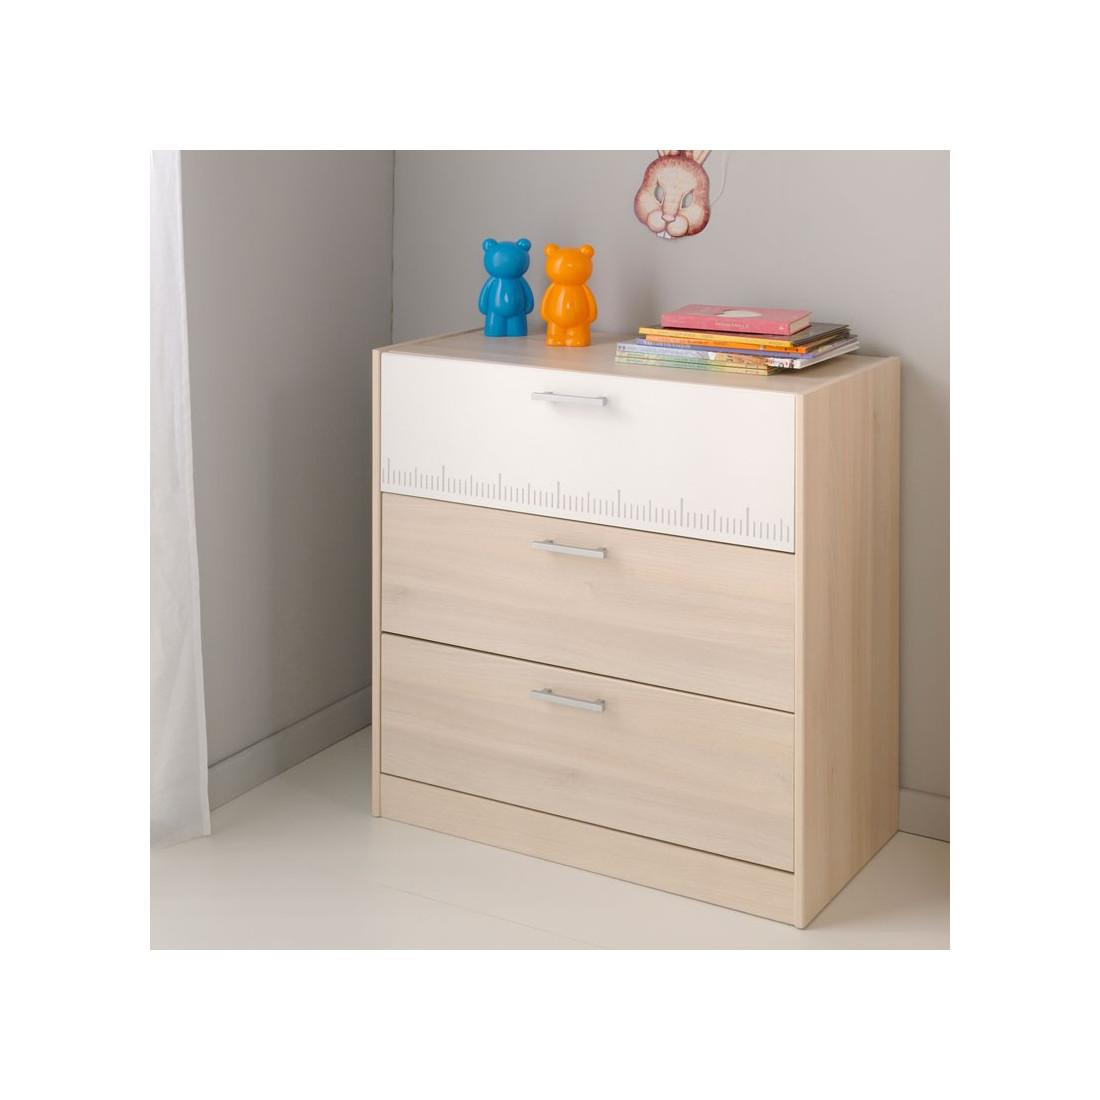 commode enfant 3 tiroirs acacia clair blanc price univers chambre. Black Bedroom Furniture Sets. Home Design Ideas